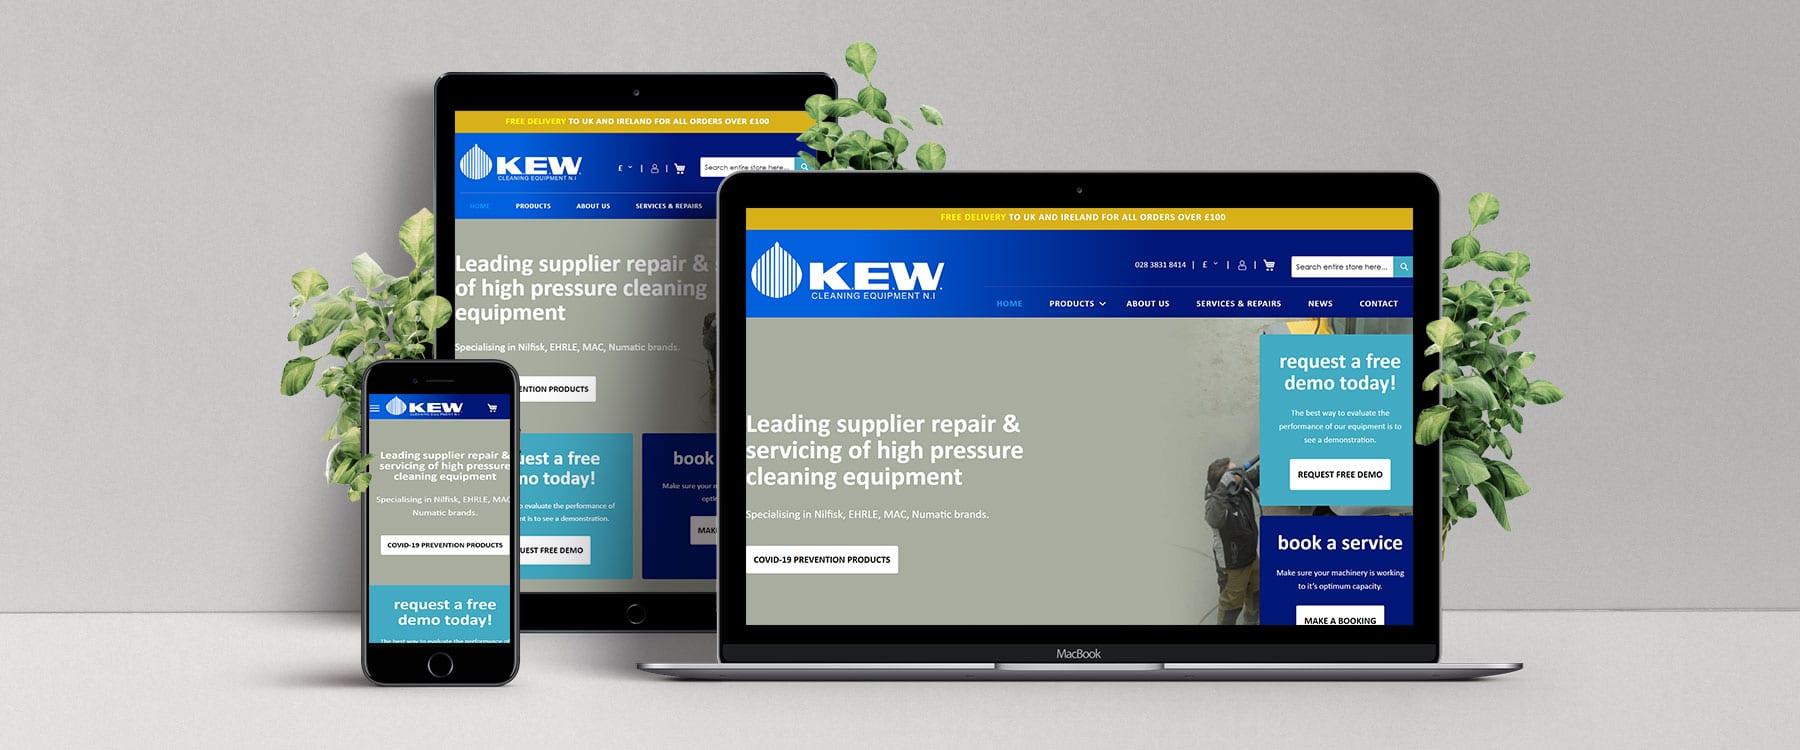 Fresh & Modern eCommerce Website for K.E.W Cleaning Equipment NI Image